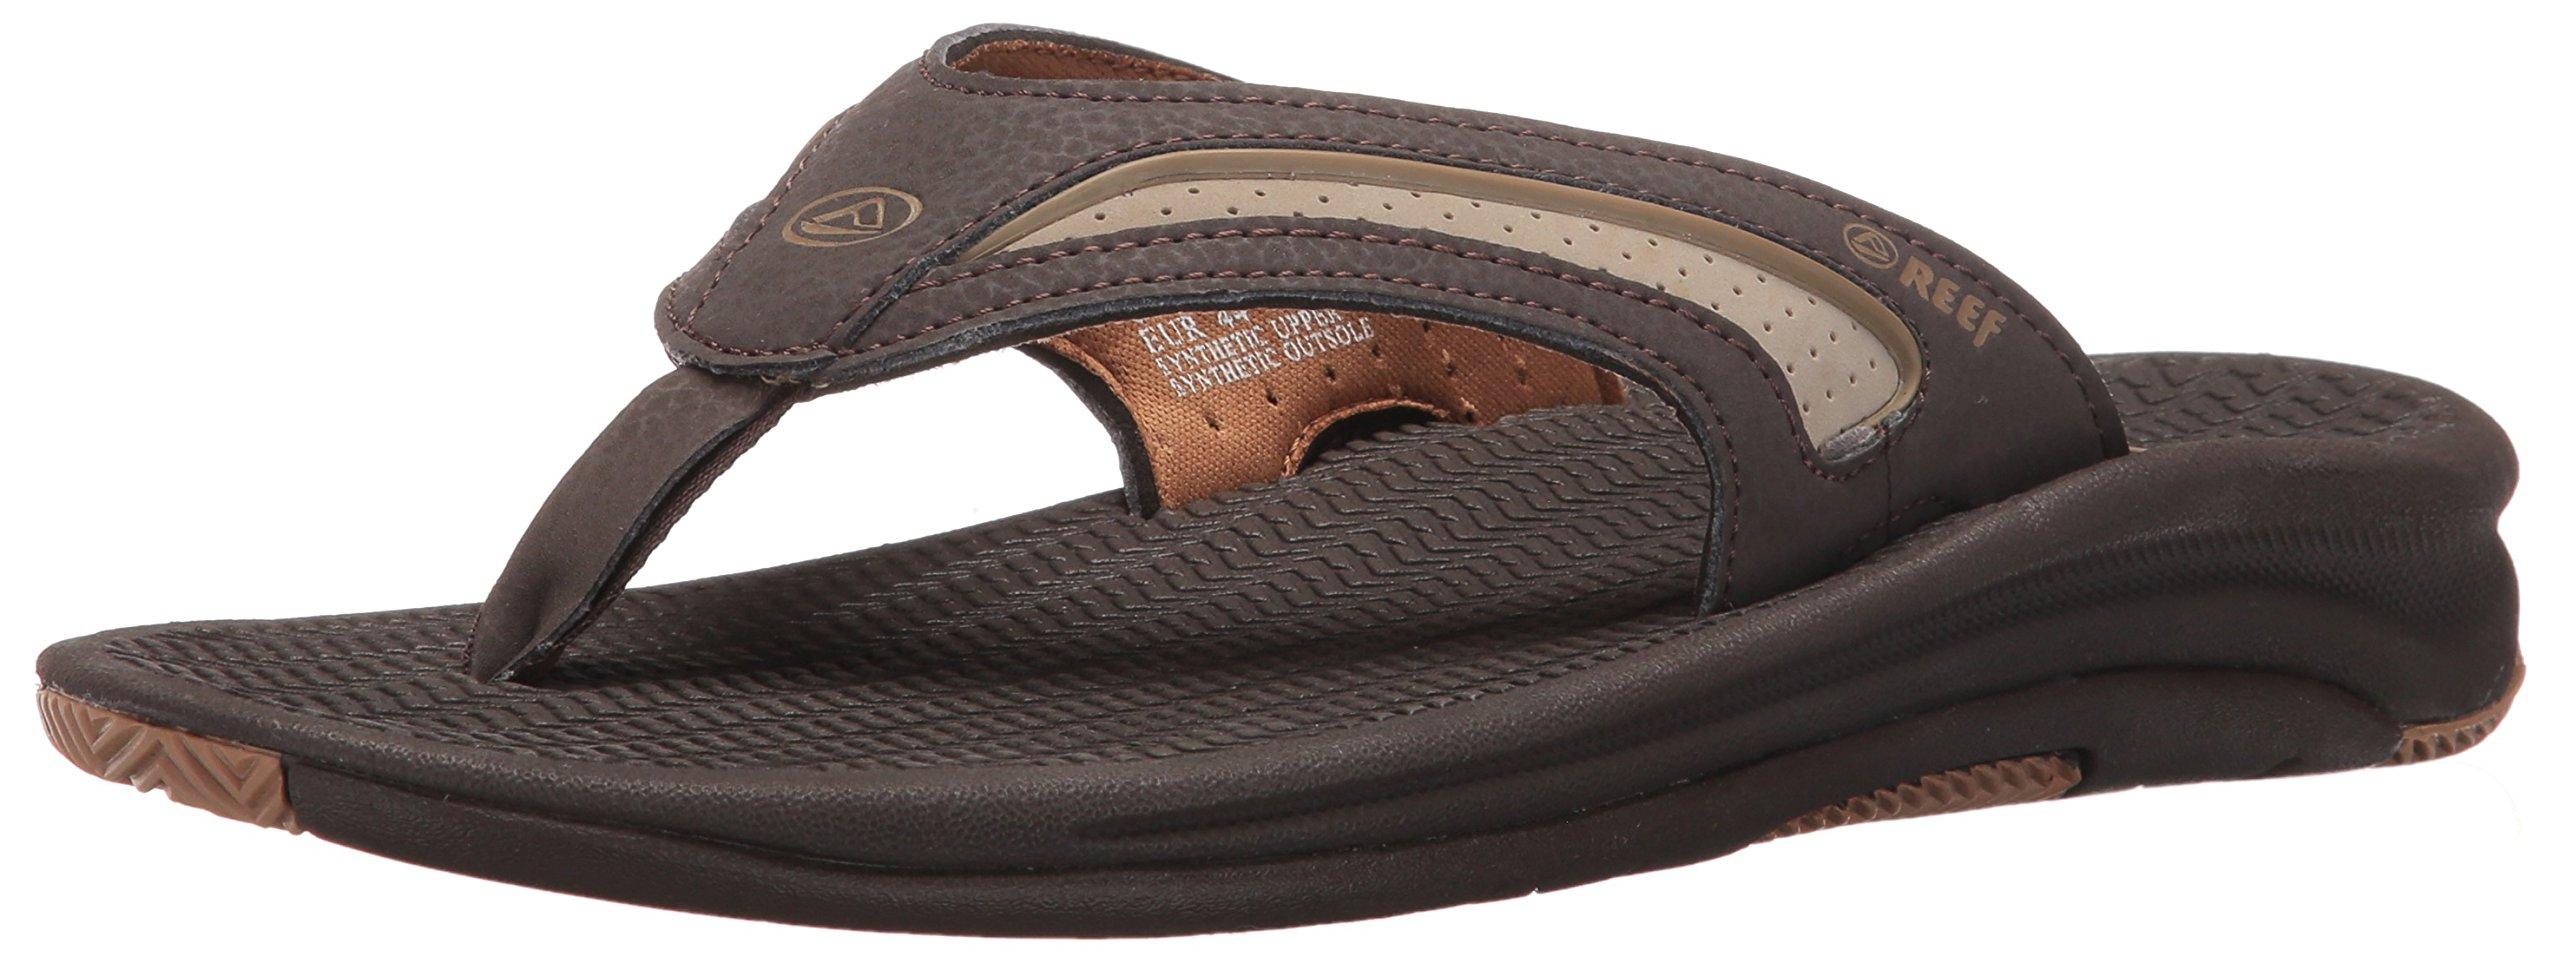 Reef Men's Flex Sandal, Dark Brown Tan, 7 M US